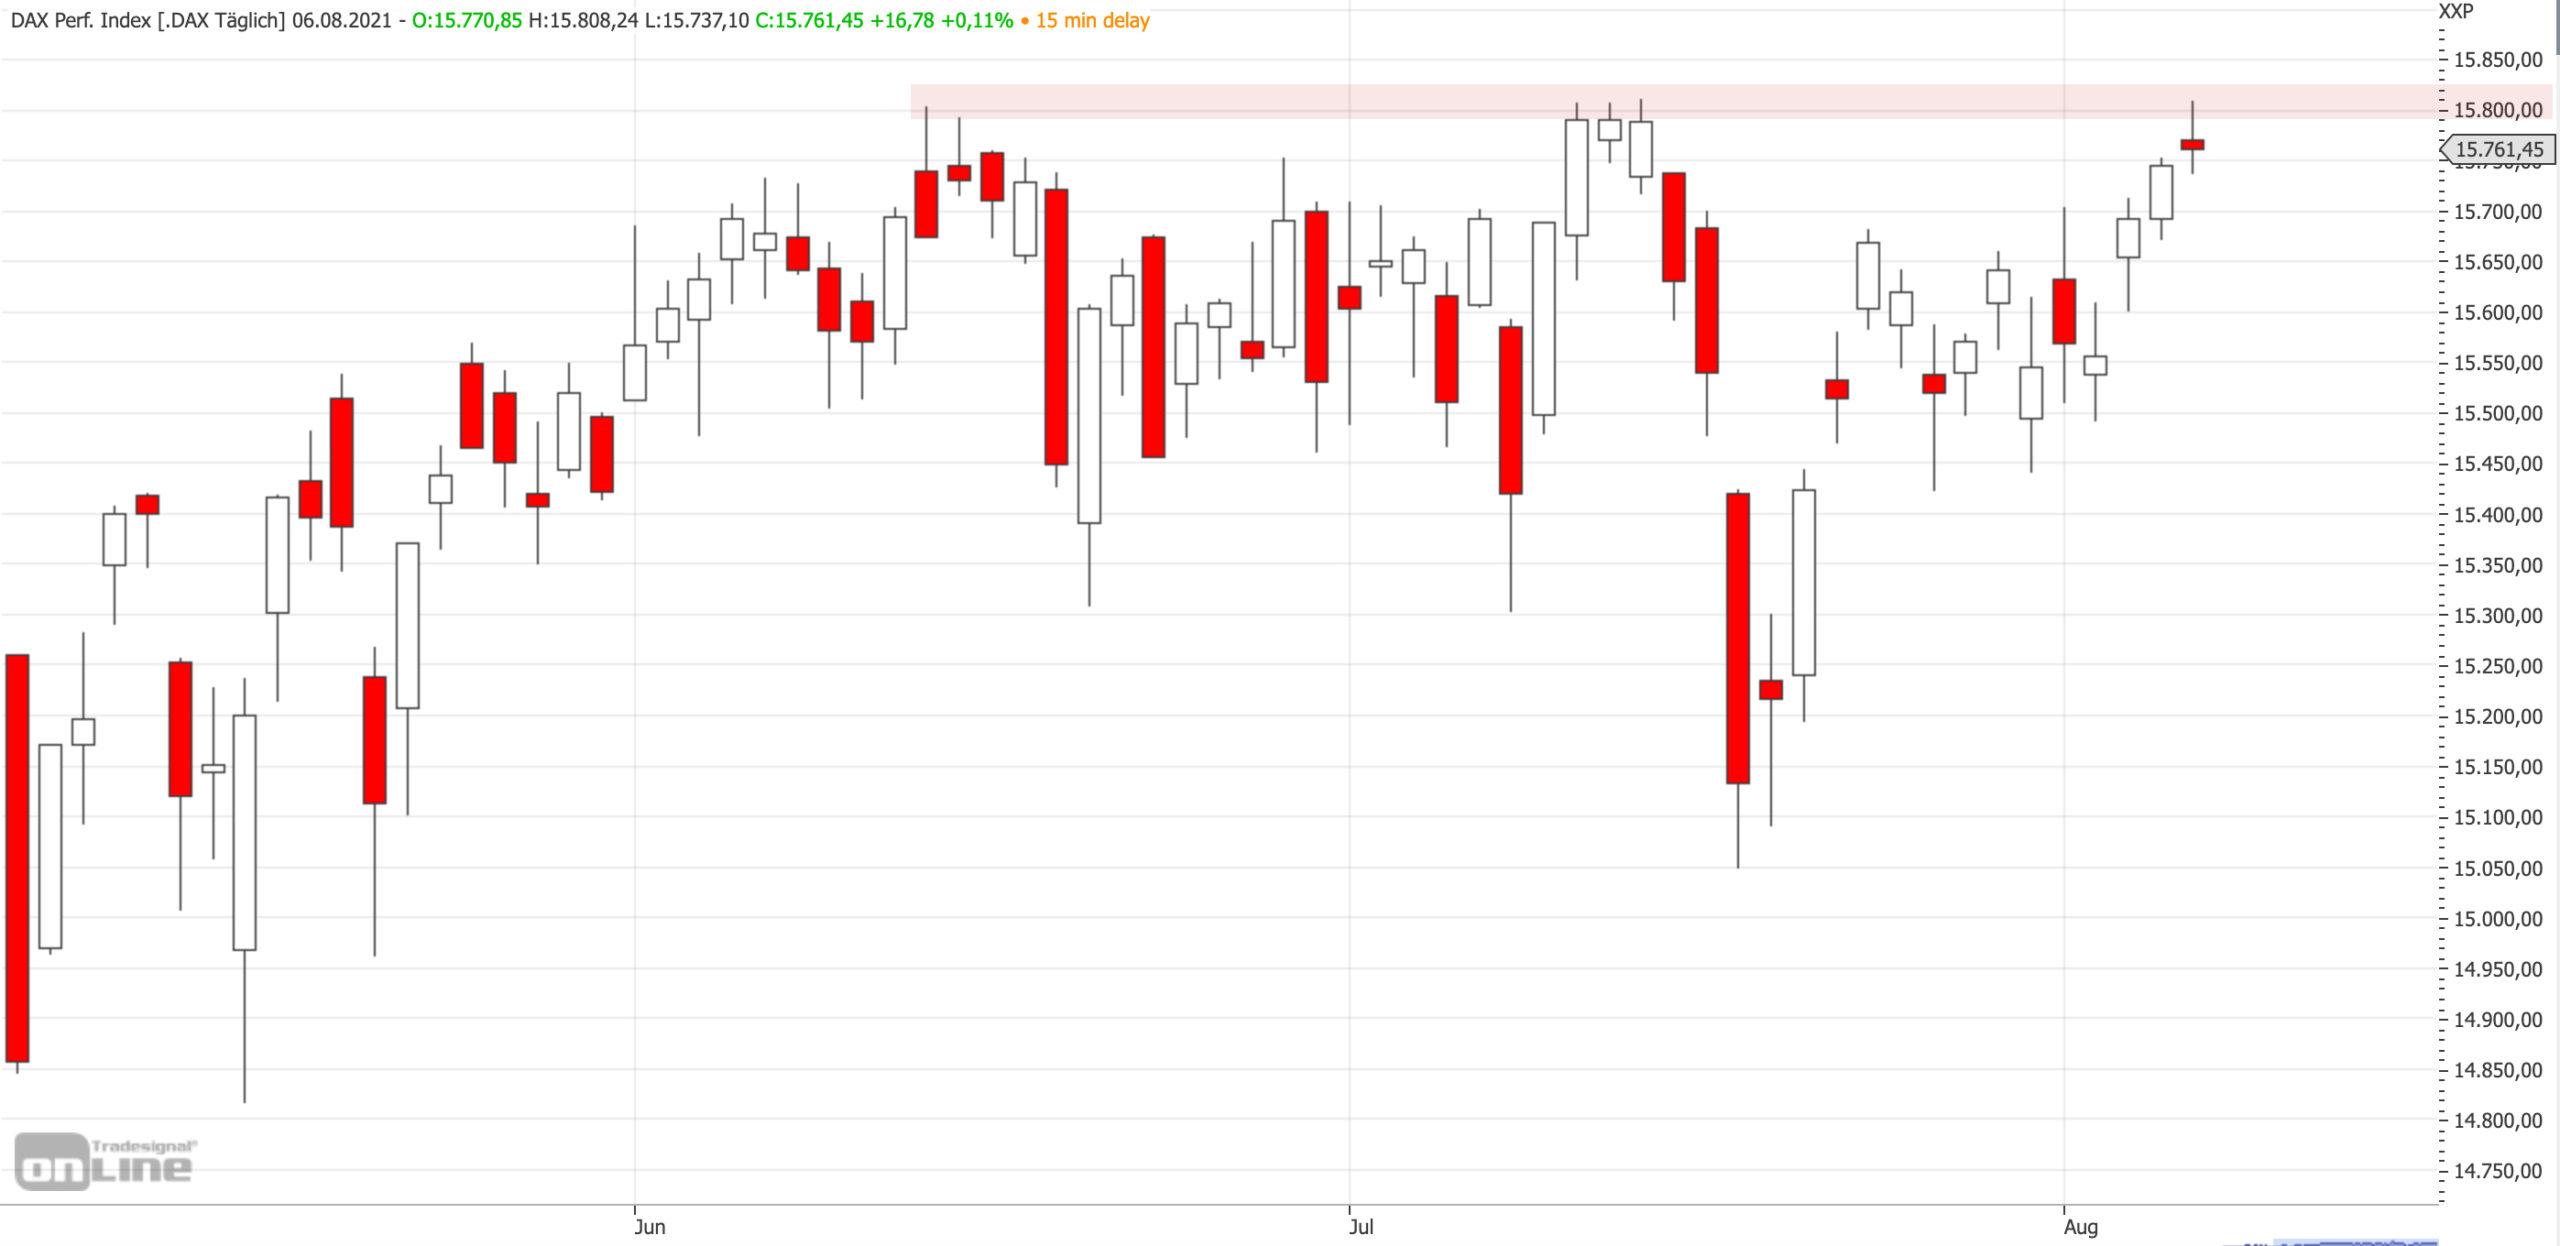 Mittelfristiger DAX-Chart am 06.08.2021